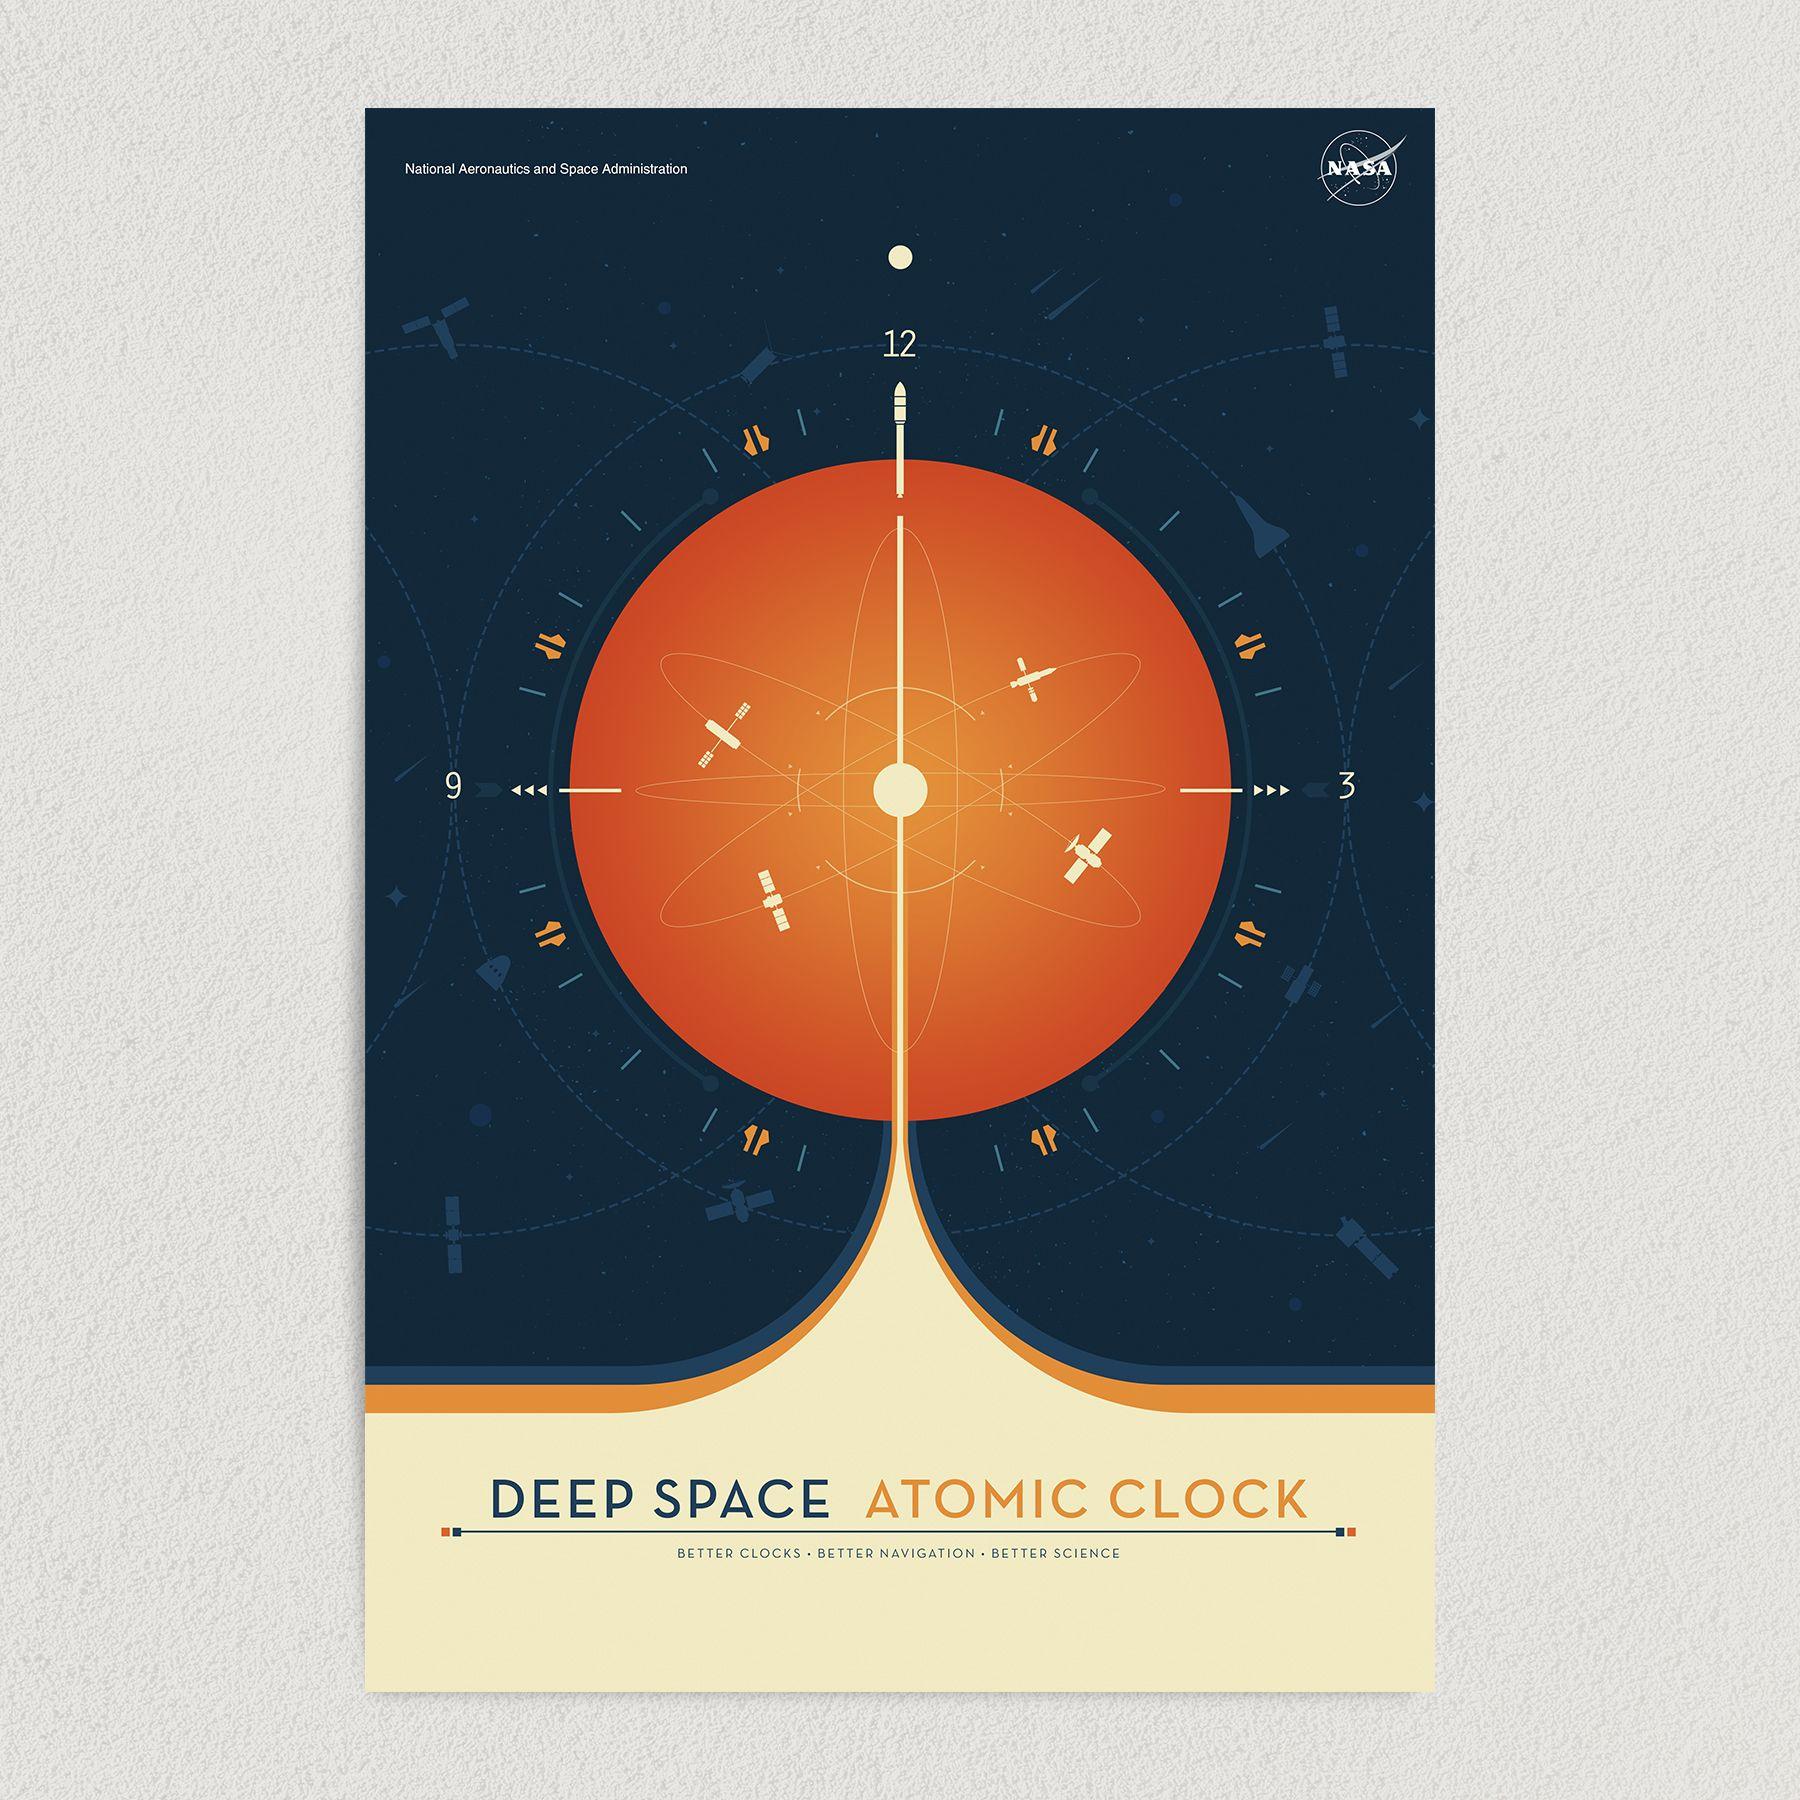 Deep Space Atomic Clock NASA Art Print Poster 12″ x 18″ Wall Art S3327